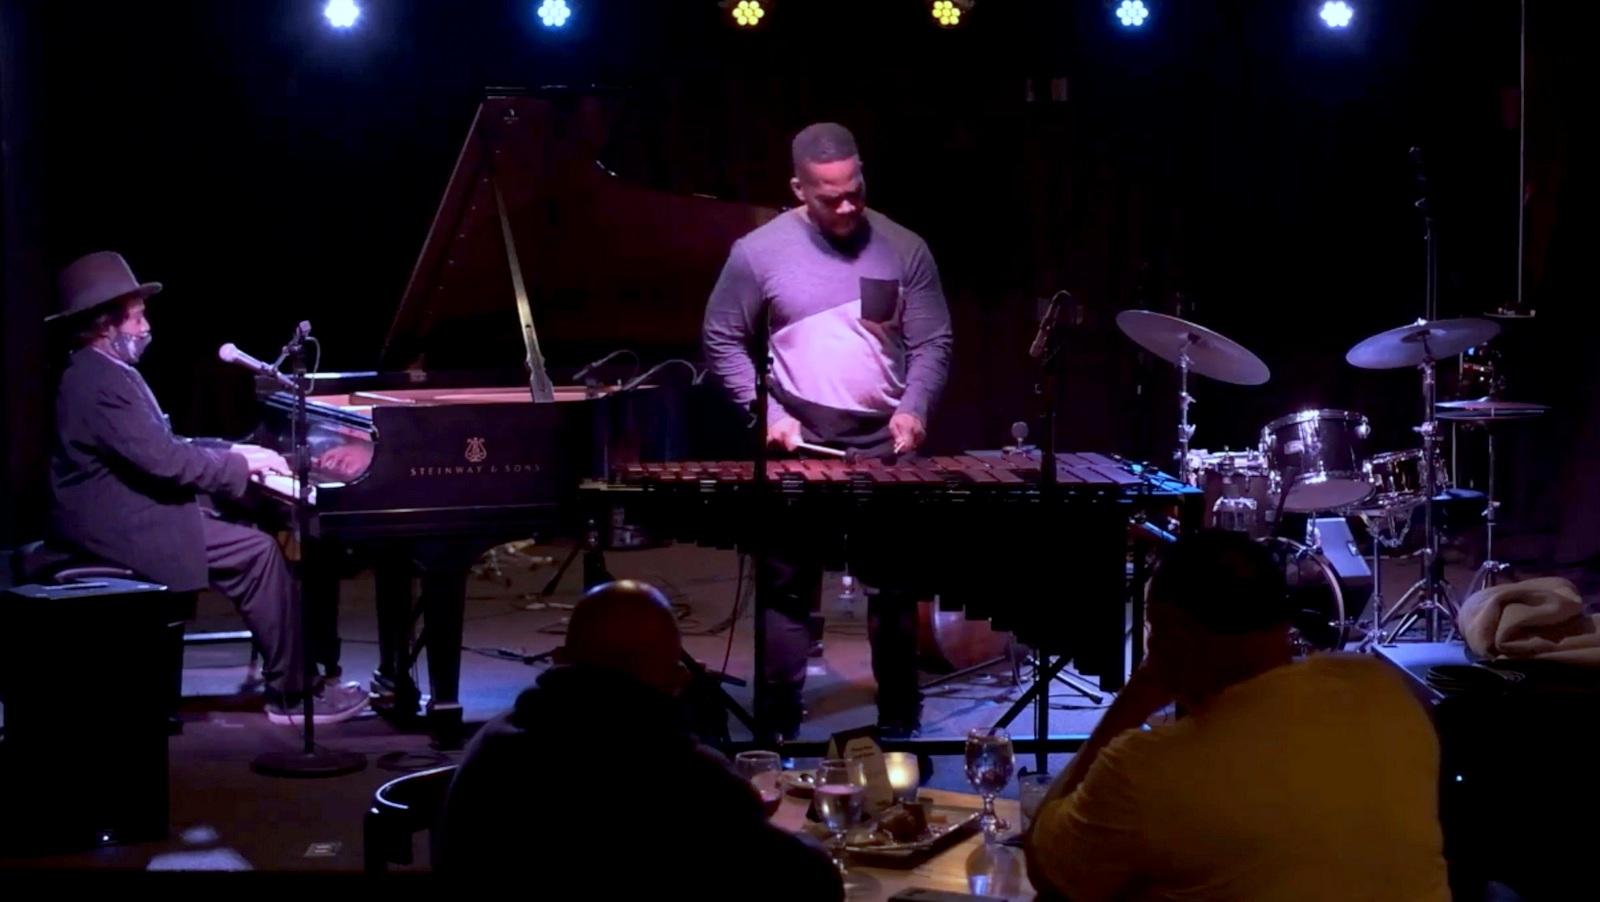 Warren Wolf performs at Keystone Korner in November before indoor dining in Baltimore was suspended. (YouTube)